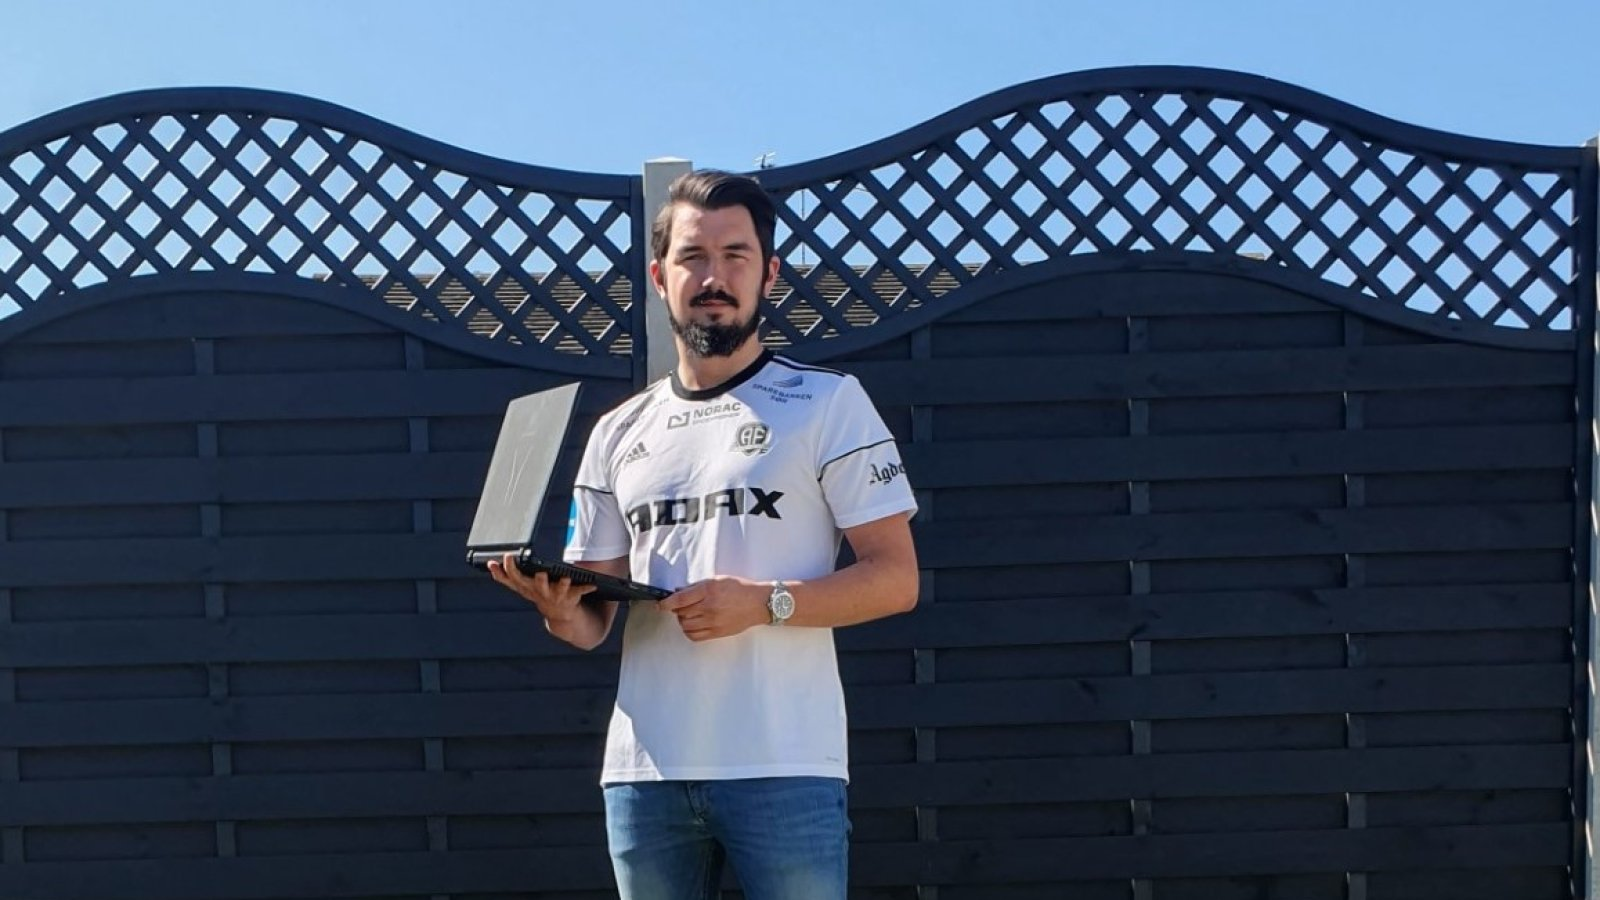 Louis King har spilt Arendal Fotball frem til europacuptriumfer og en lang rekke trofeer i spillet Football Manager. FOTO: PRIVAT